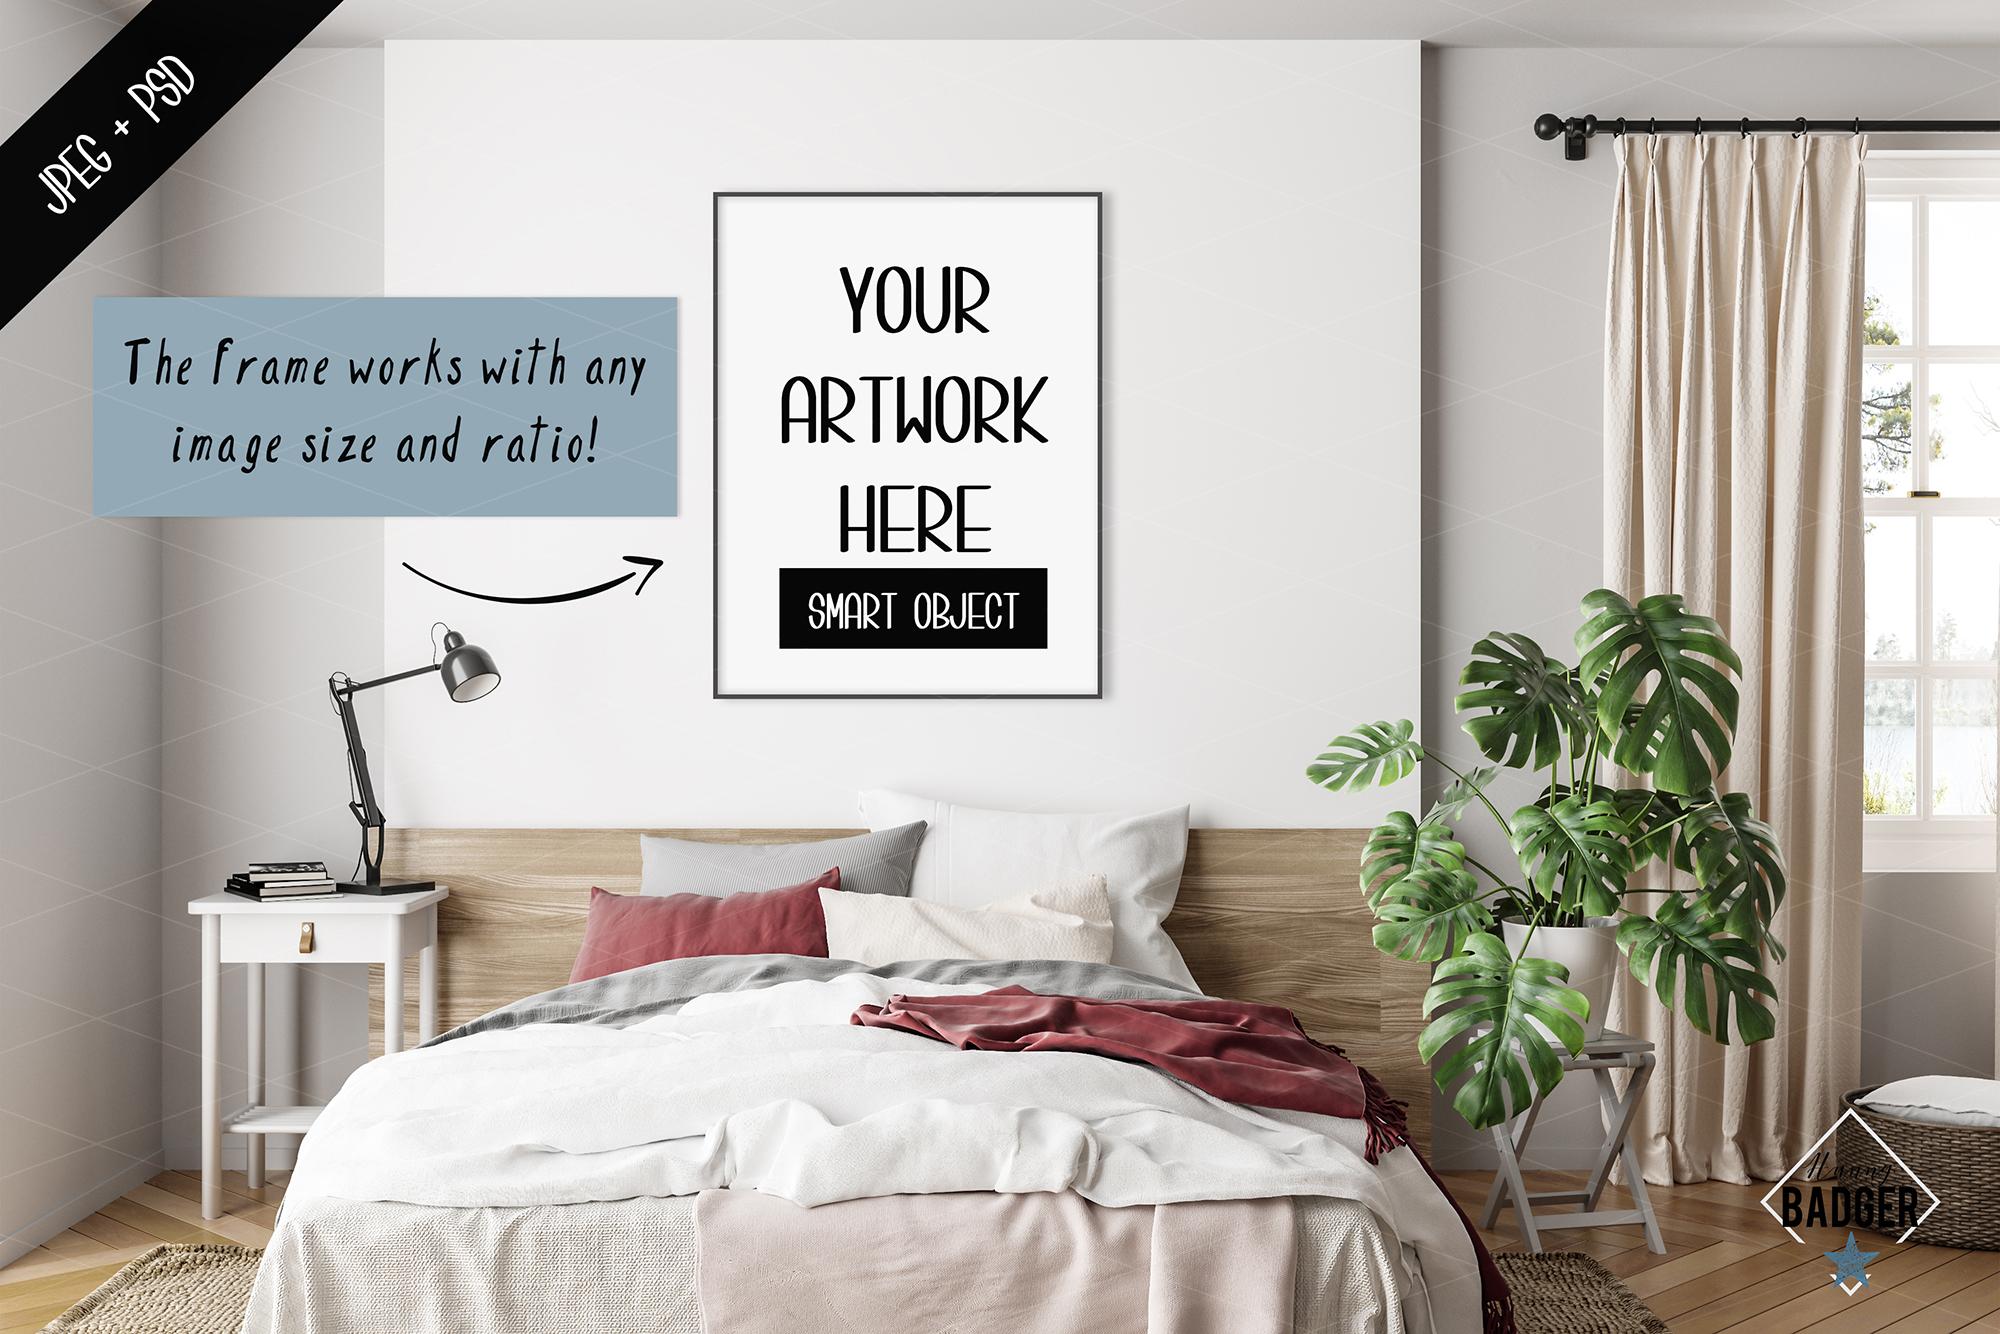 Interior mockup BUNDLE - frame & wall mockup creator example image 2